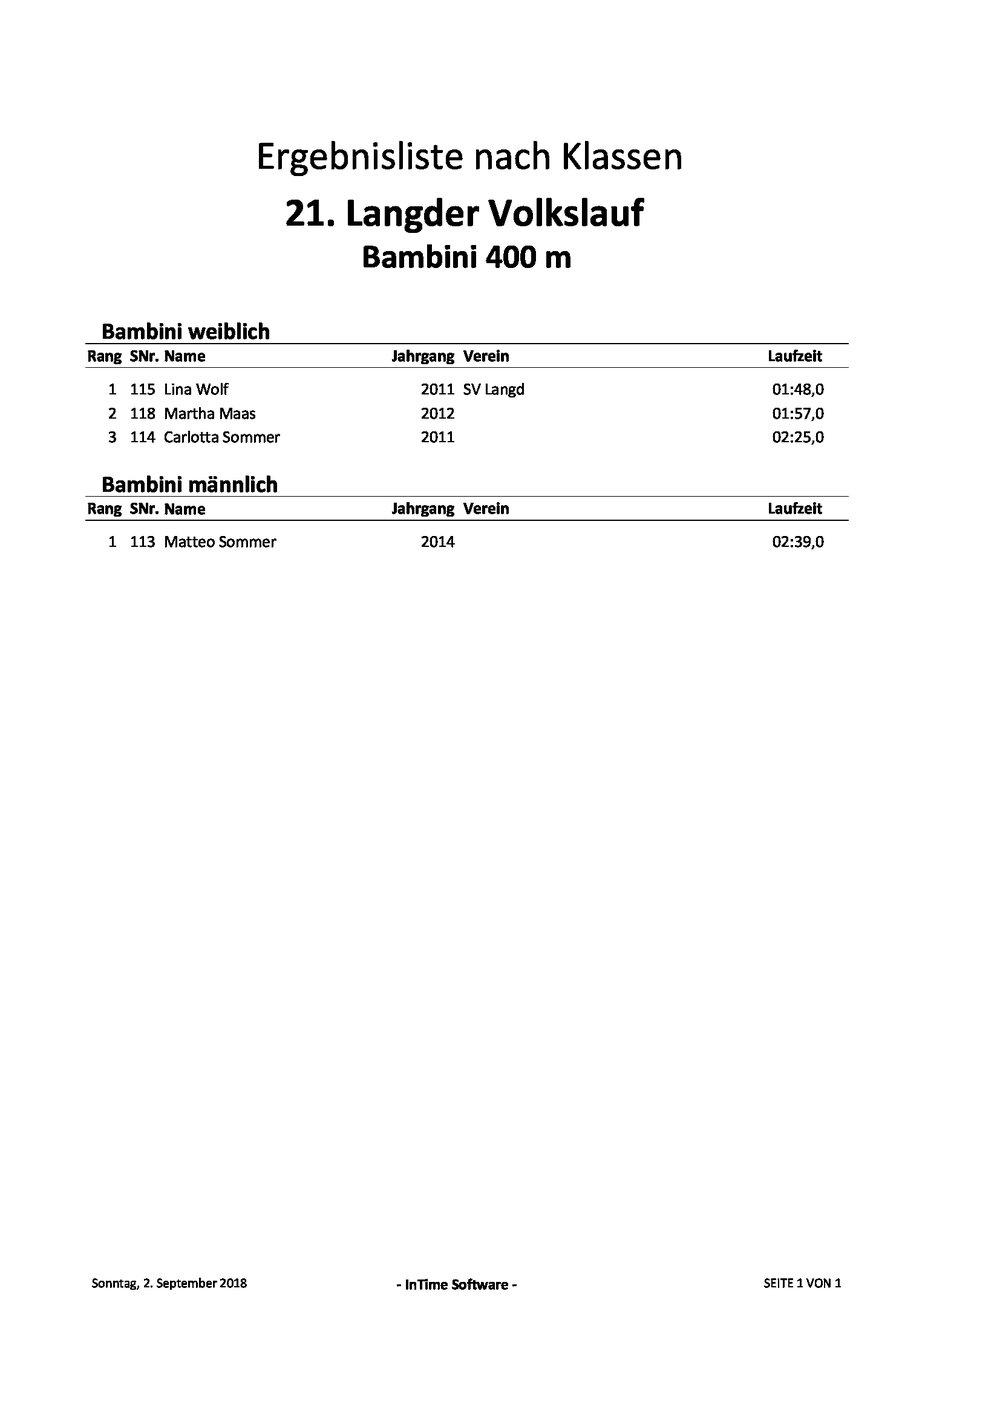 Ergebnisliste_Langd2018_Bambinis400m.jpg